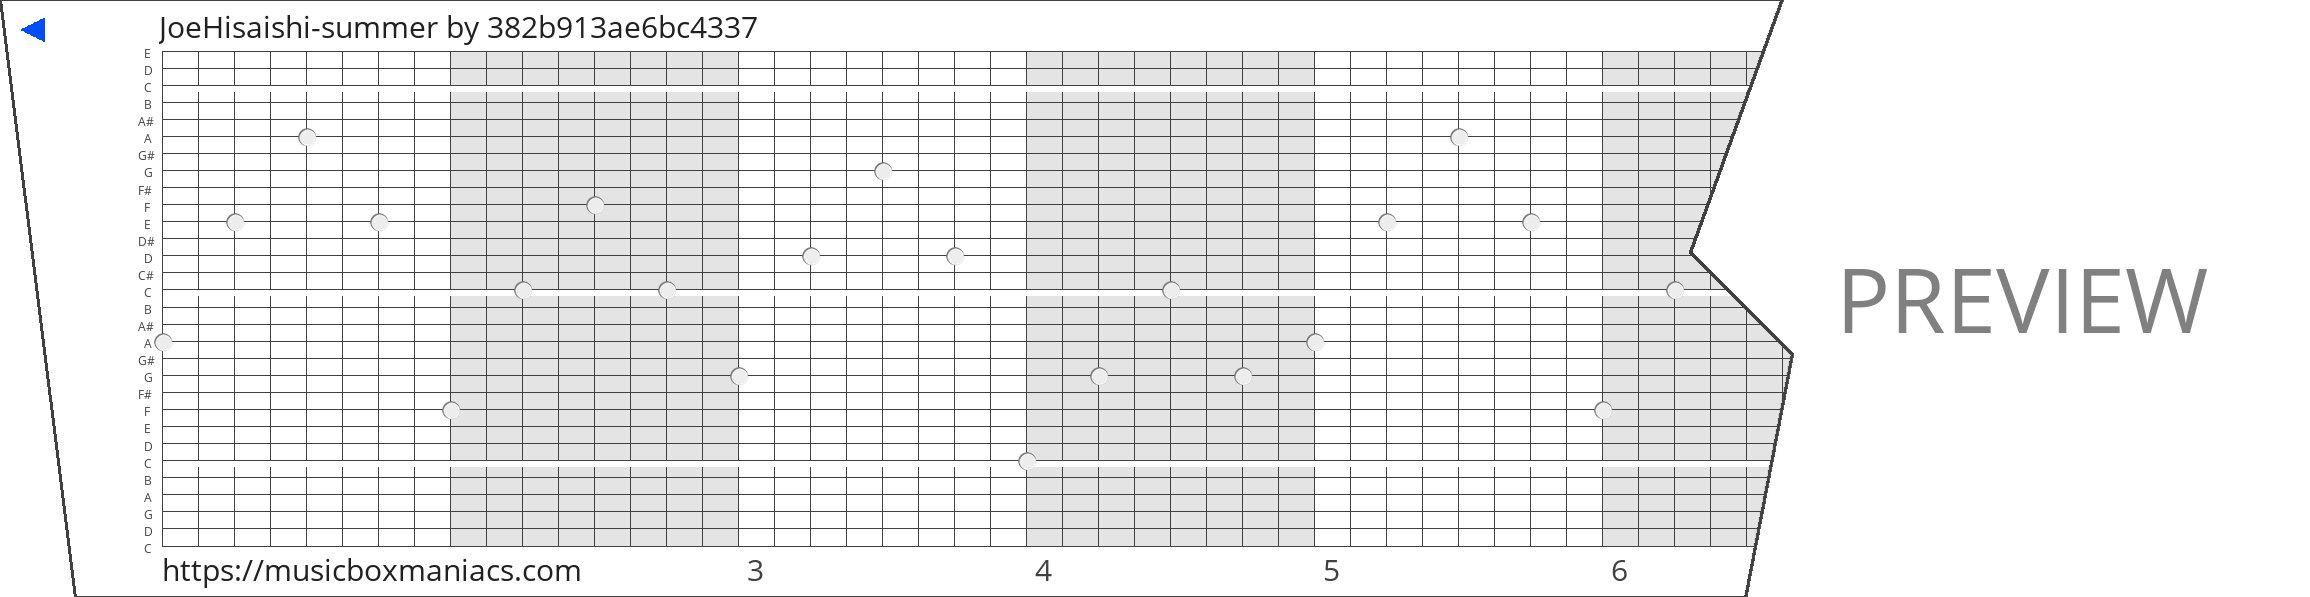 JoeHisaishi-summer 30 note music box paper strip